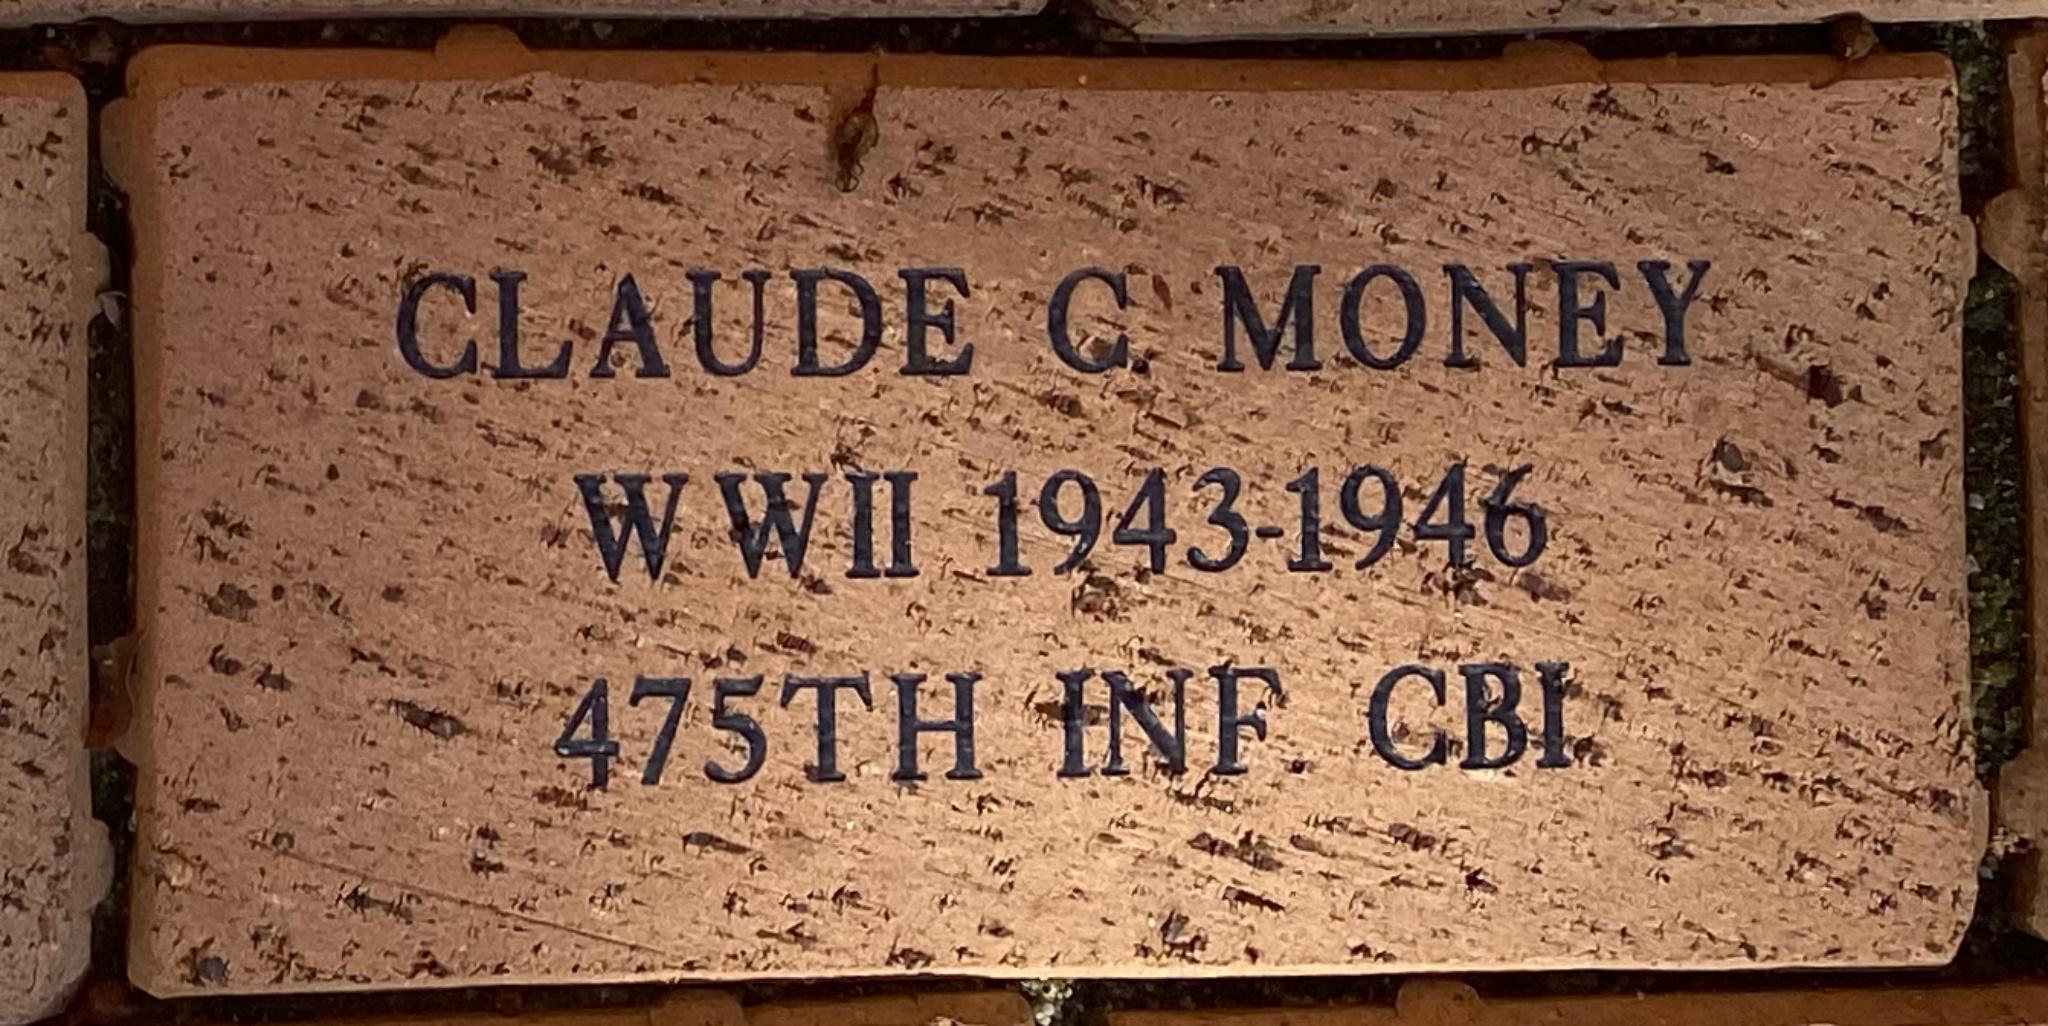 CLAUDE C. MONEY WWII 1943-1946 475TH INF. CBI